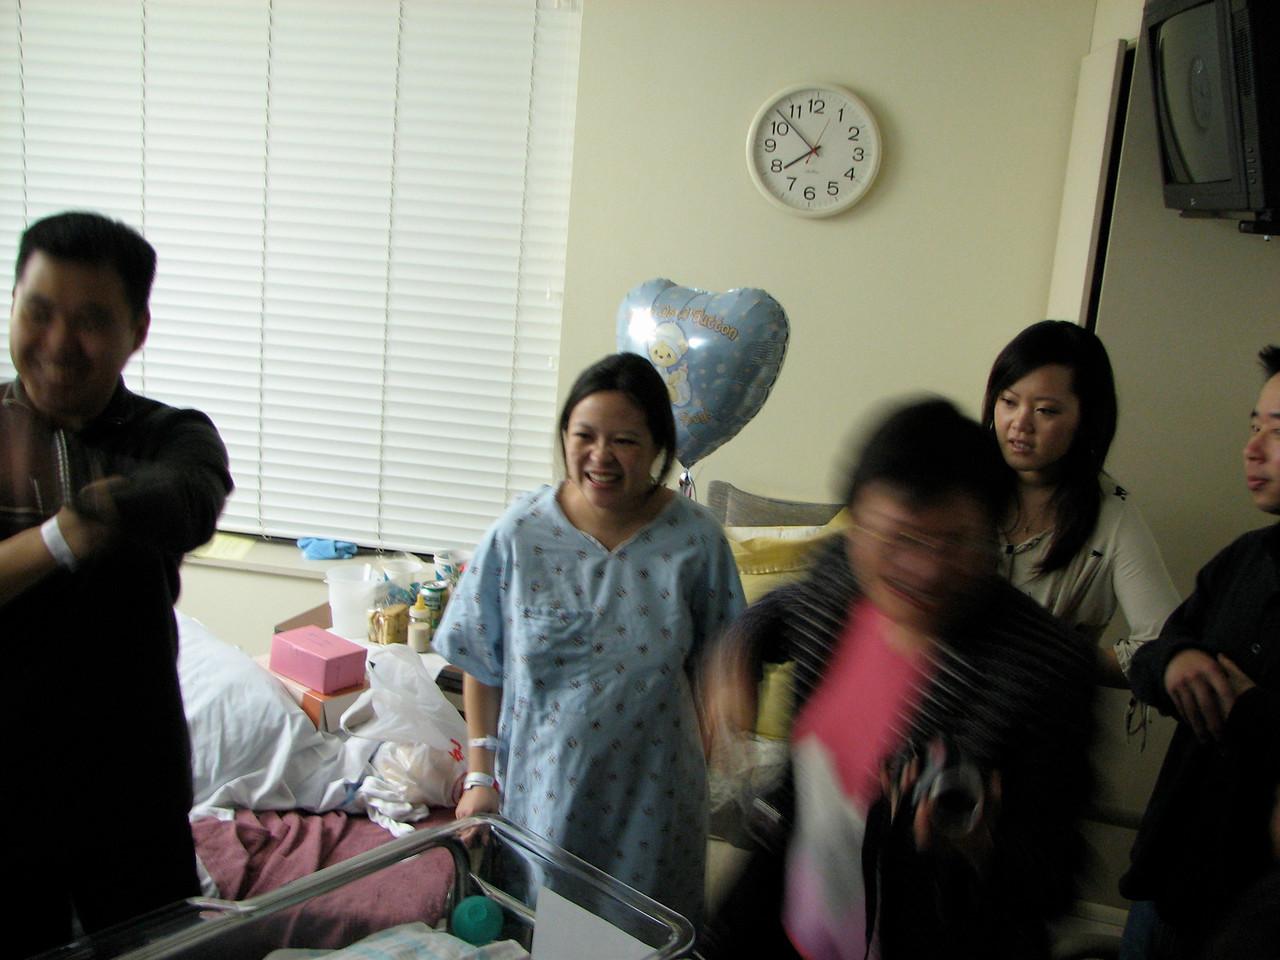 2007 03 23 Fri - Family & friends